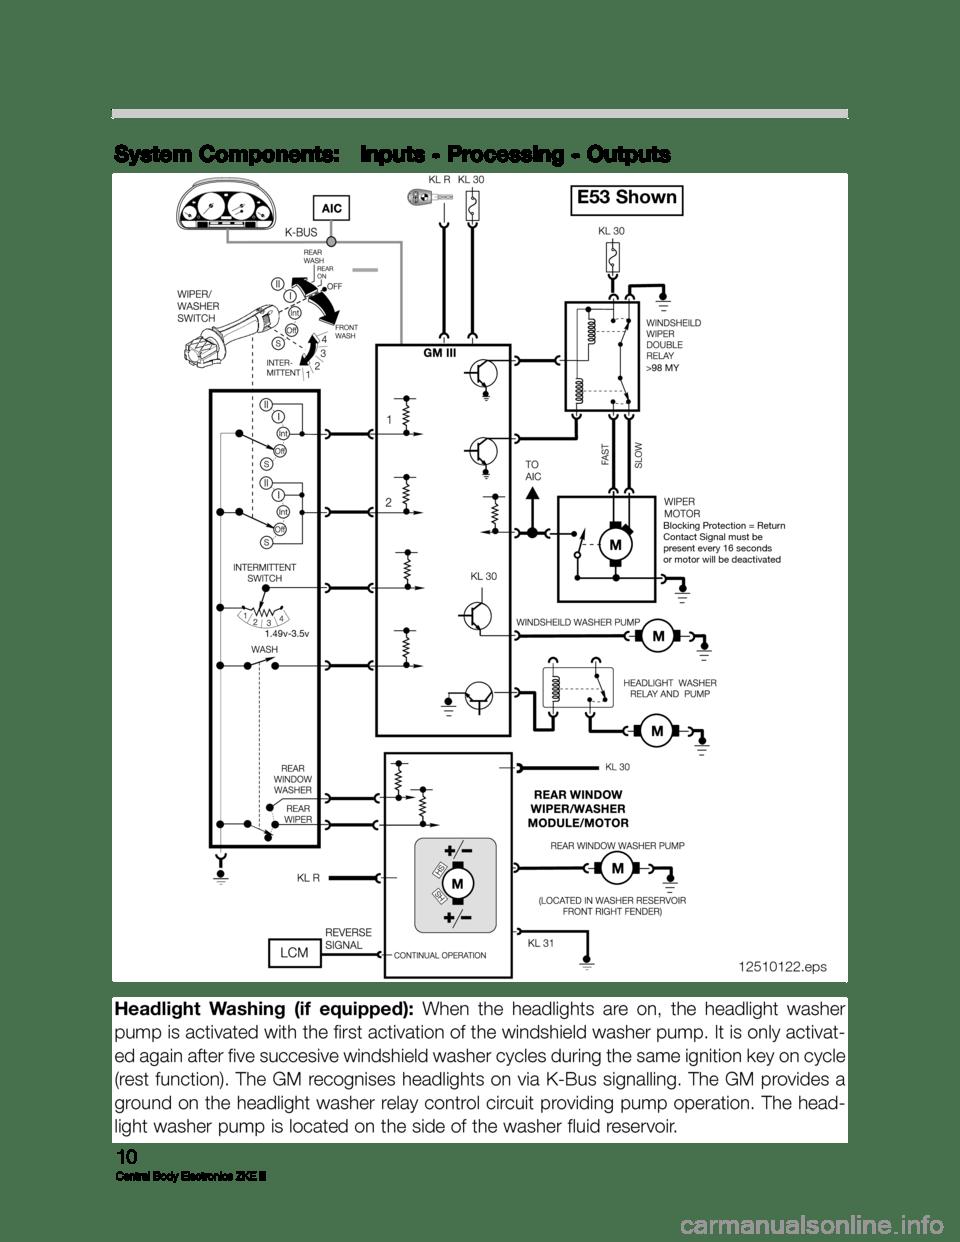 medium resolution of 2003 bmw x5 engine diagram wiring diagrams favorites03 bmw x5 engine diagram wiring diagram completed 03